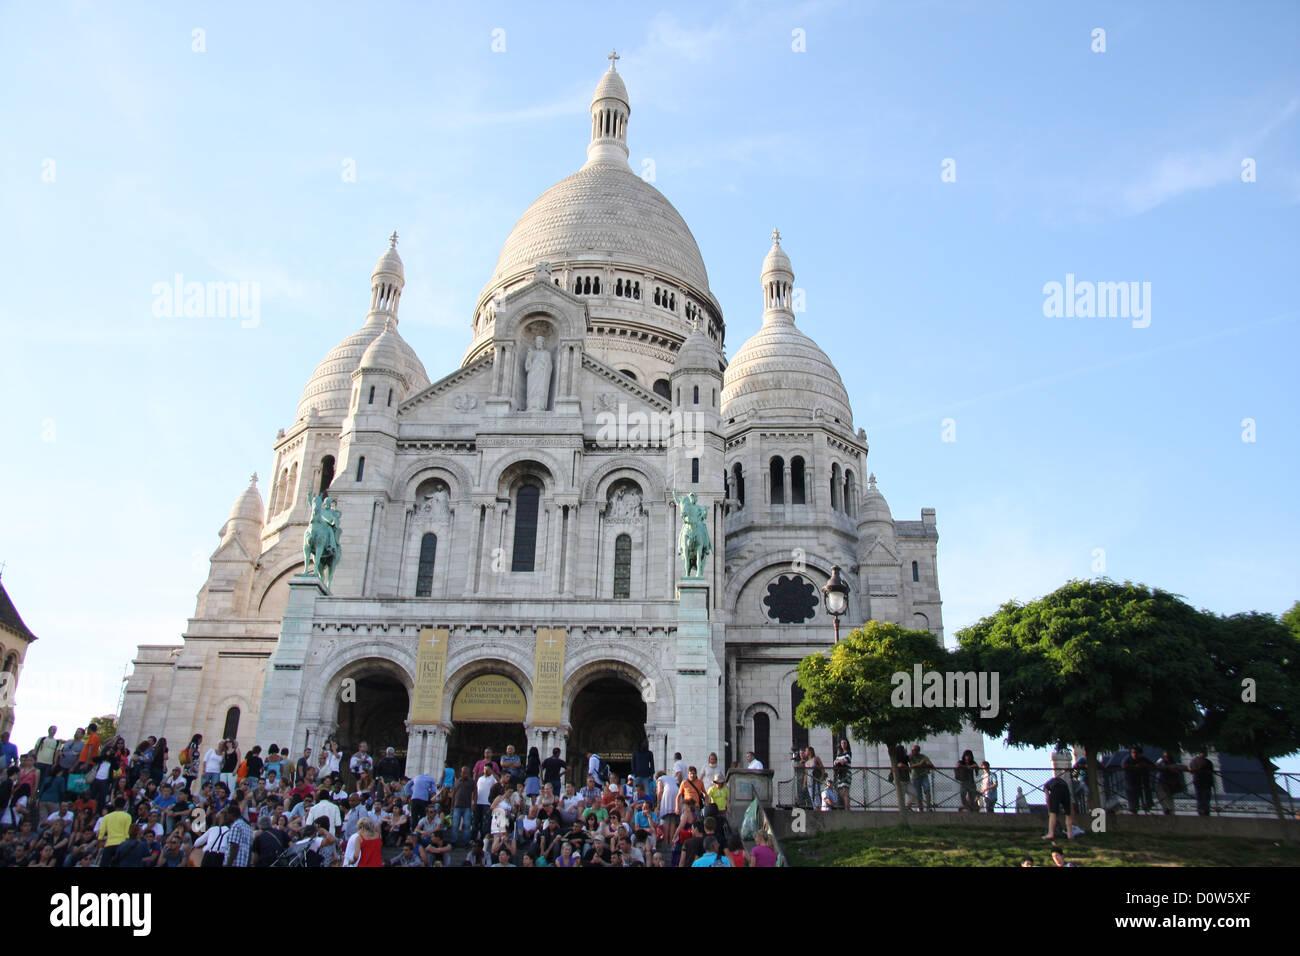 Paris, Europe, France, Sacre Coeur, church, weiss, tourists - Stock Image